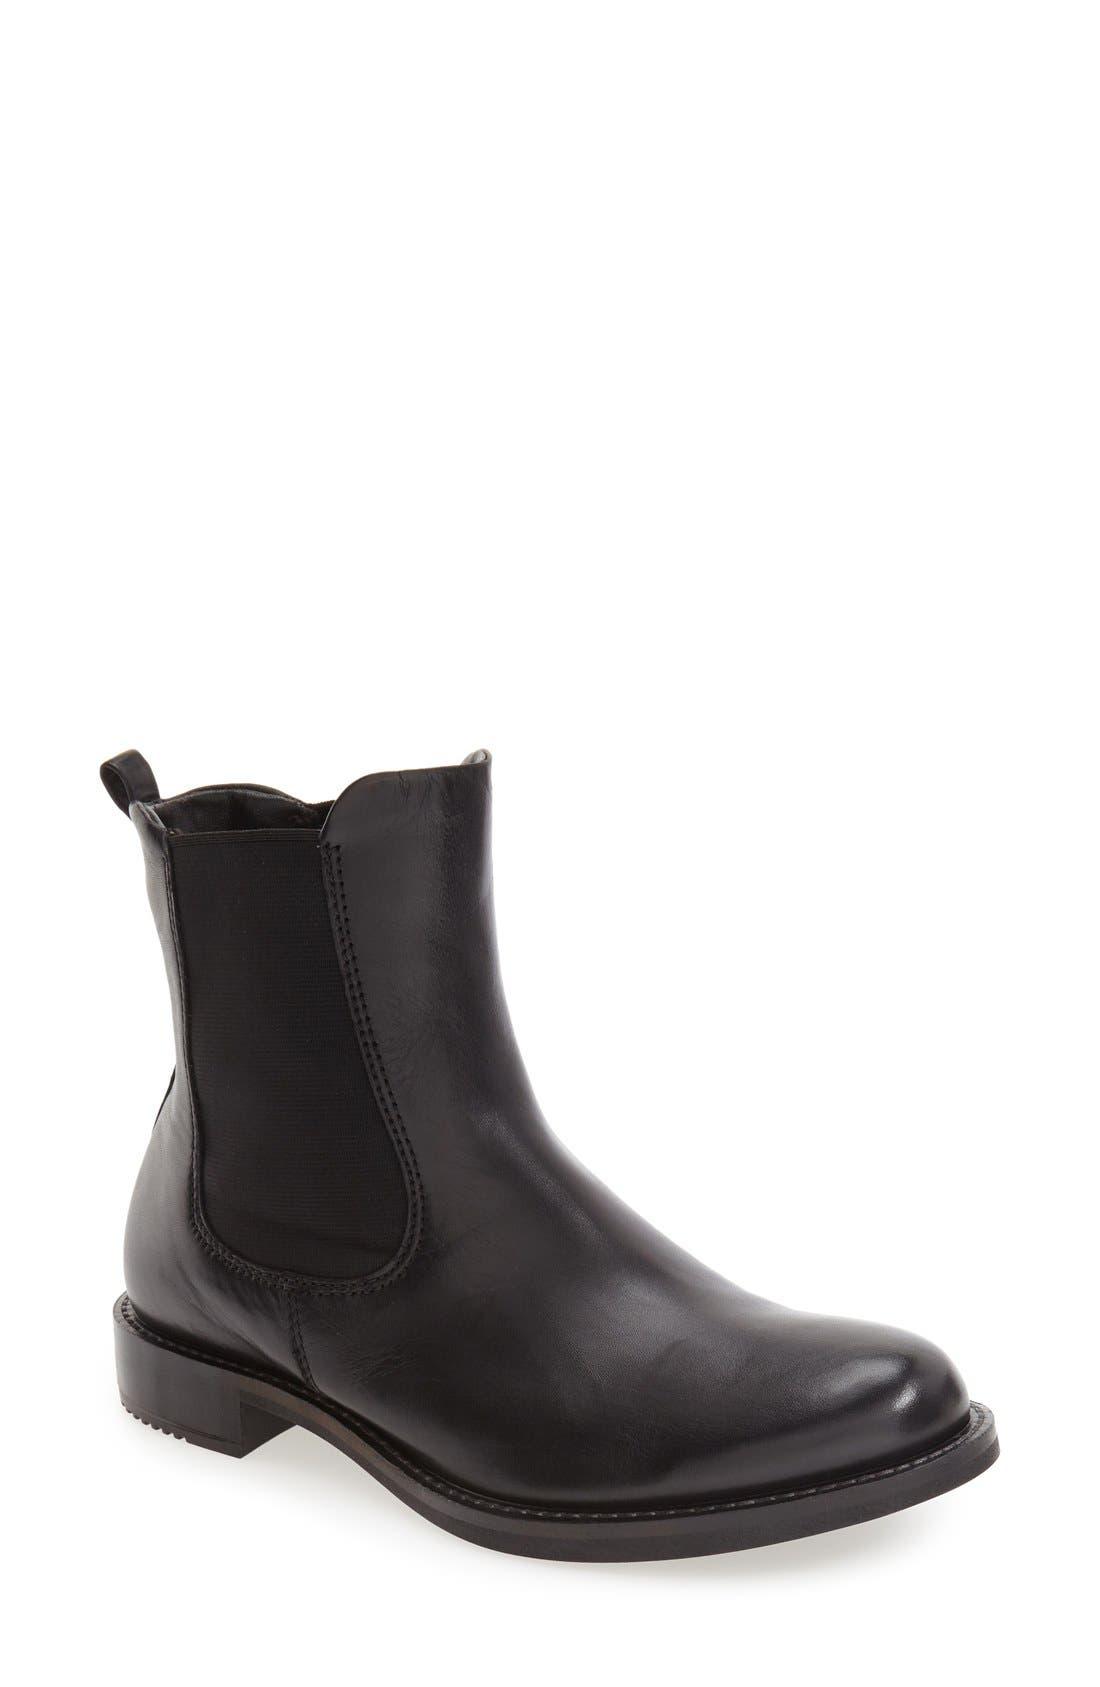 4be913724d84 Ecco  Shape 25  Chelsea Boot